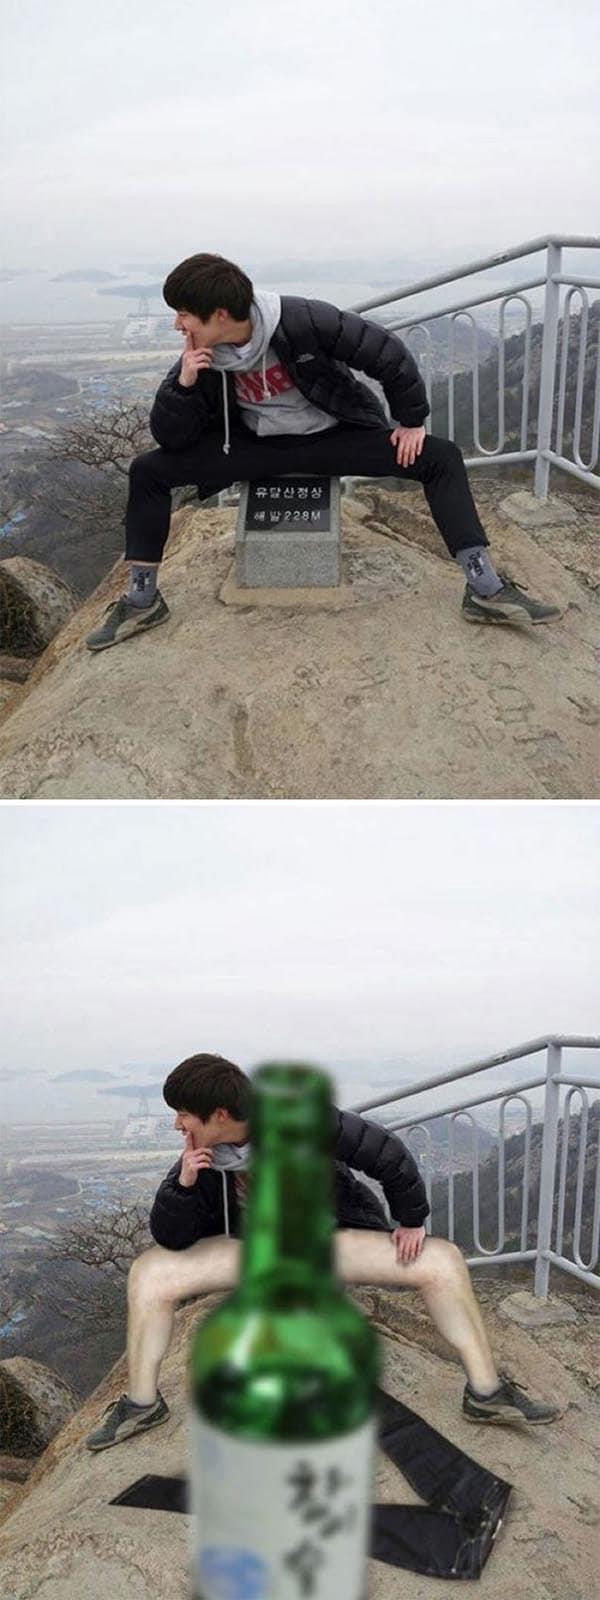 Korean Photoshop Masters please lower the pants